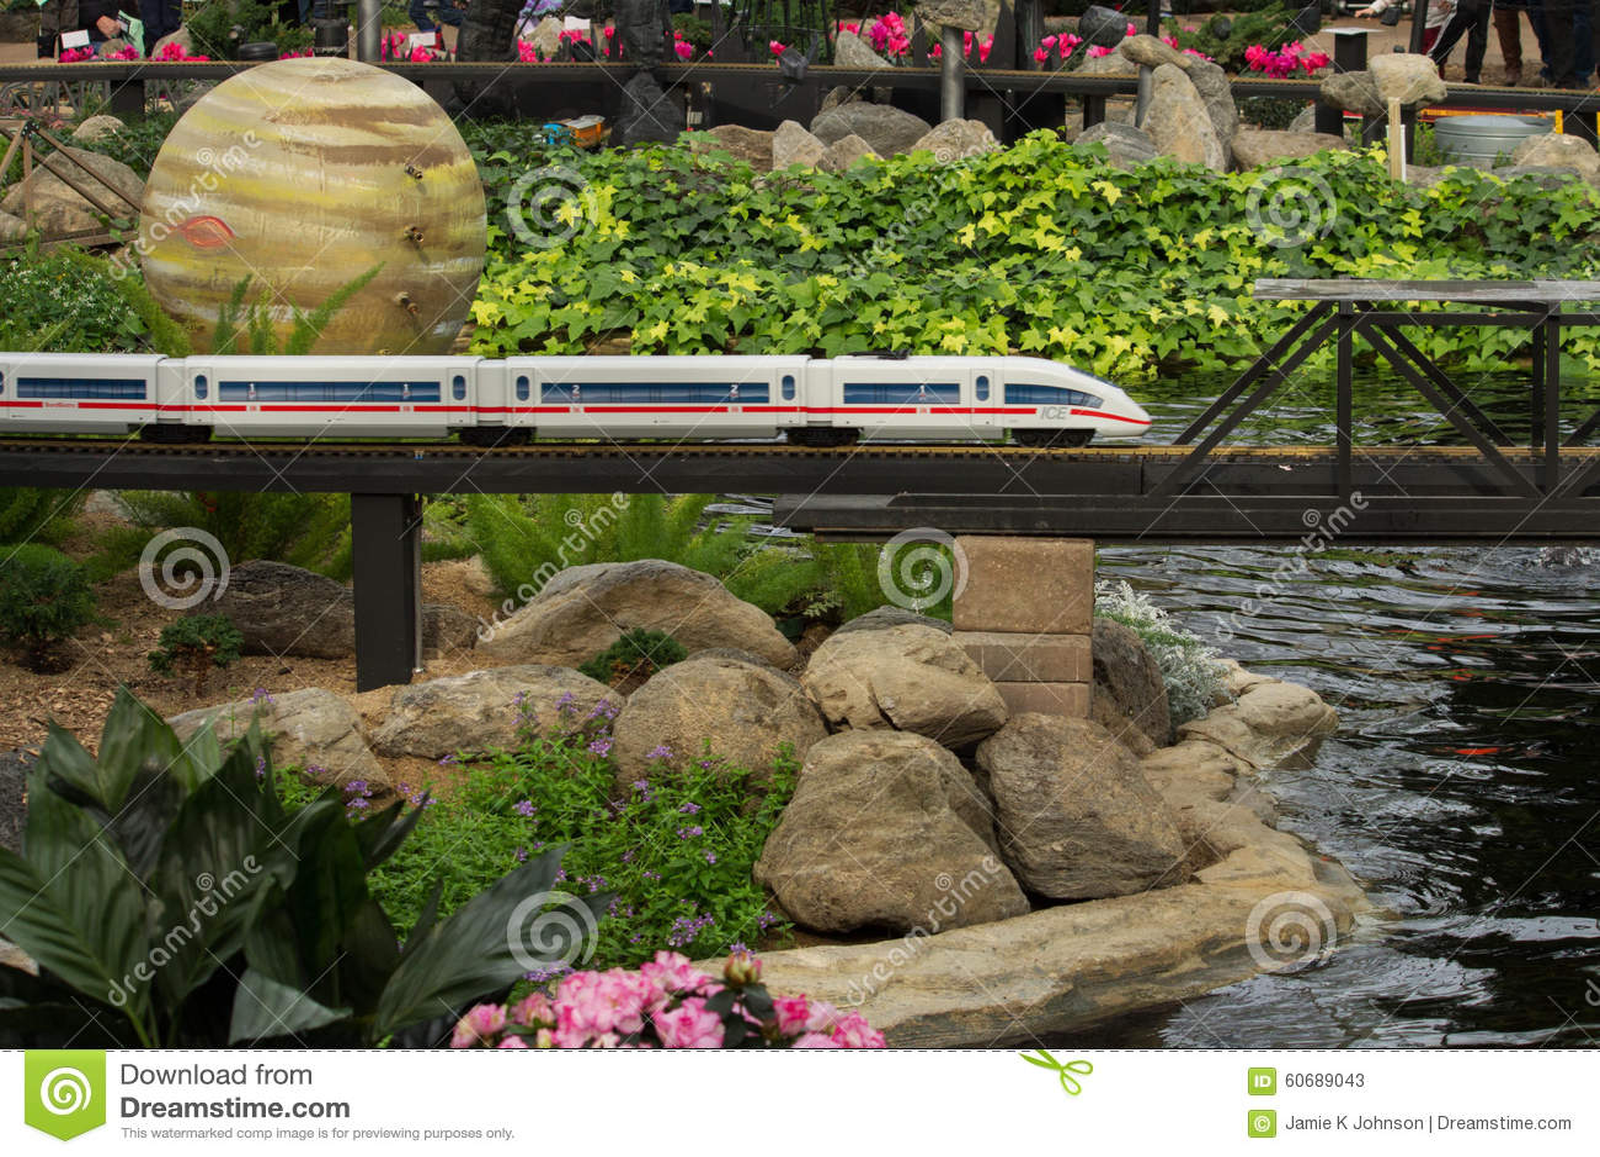 Modell Railroad Space & trädgård